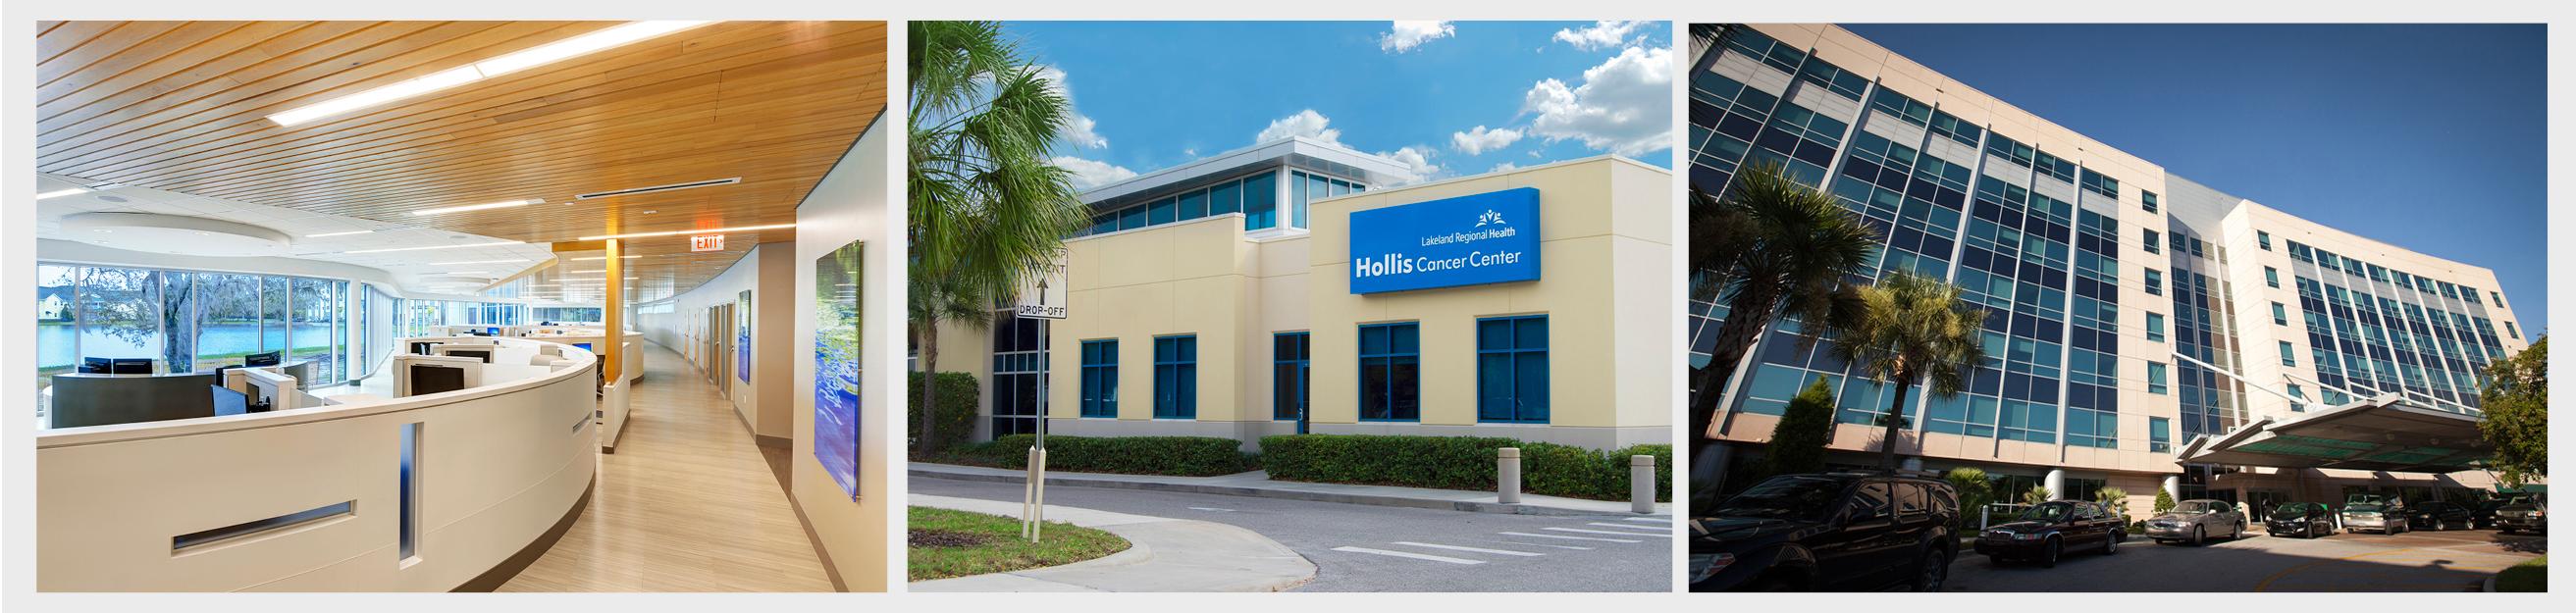 Lakeland Regional Medical Center | 100 hospitals and health